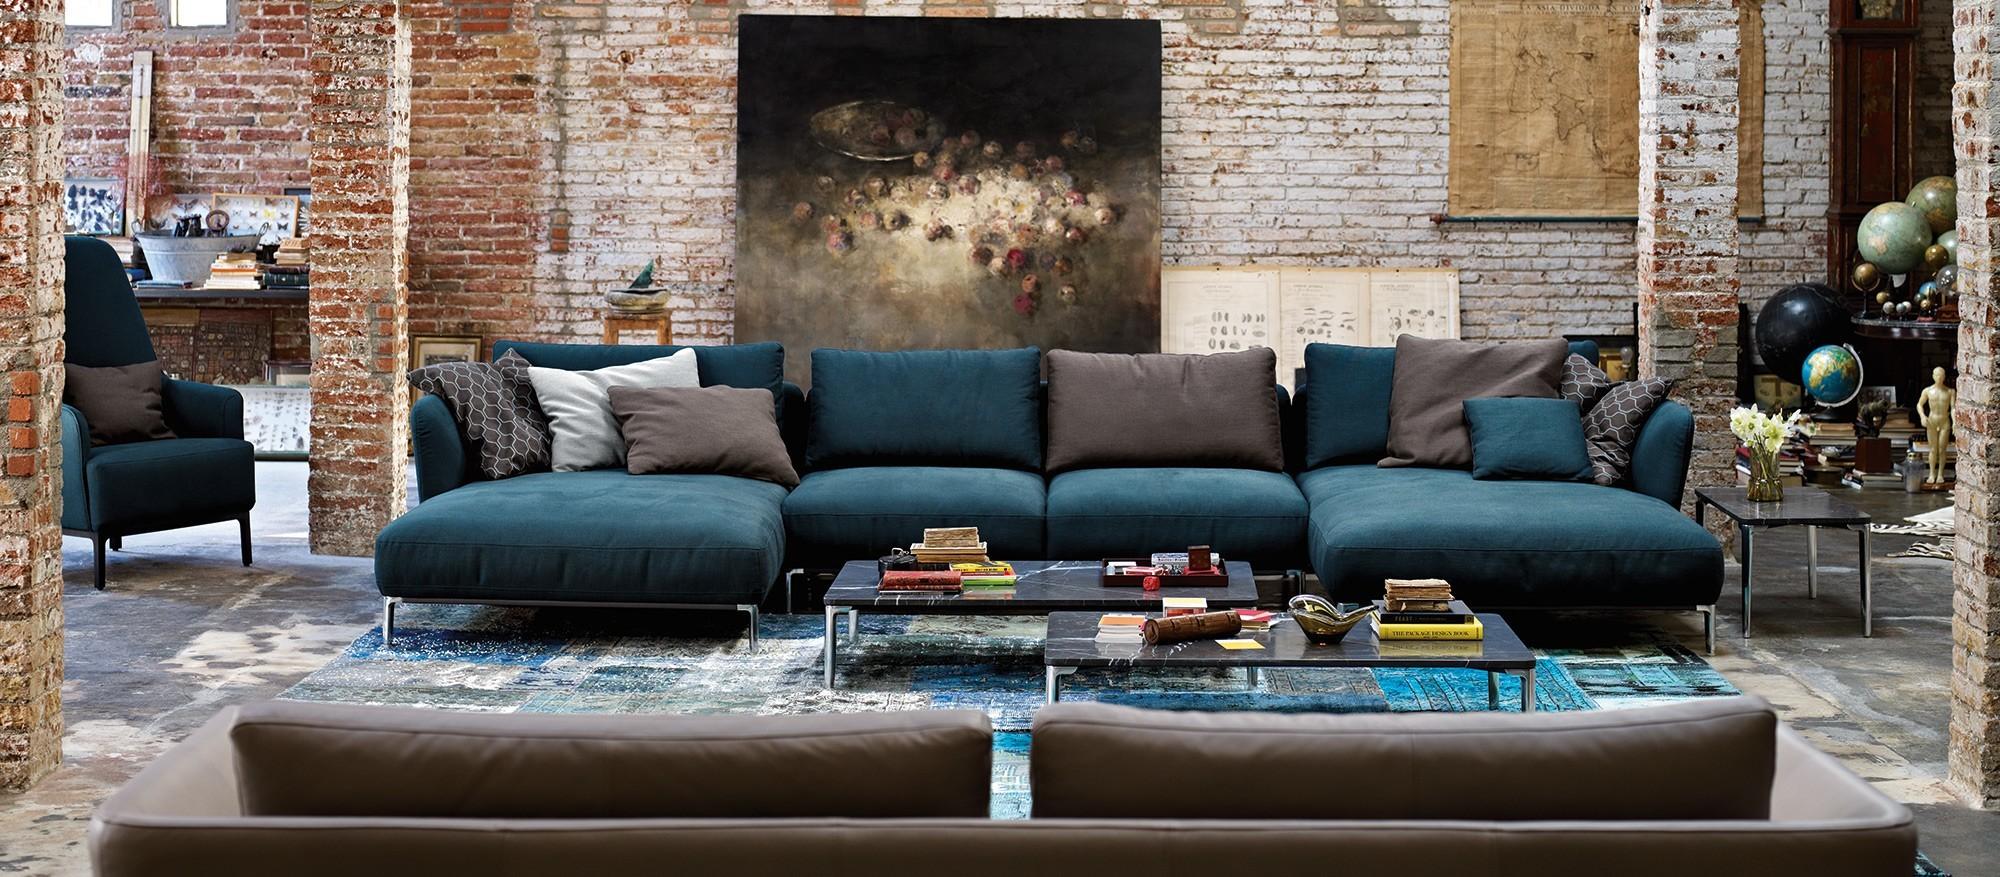 Rolf benz design meubelen interieur plus for Interieur plus peer